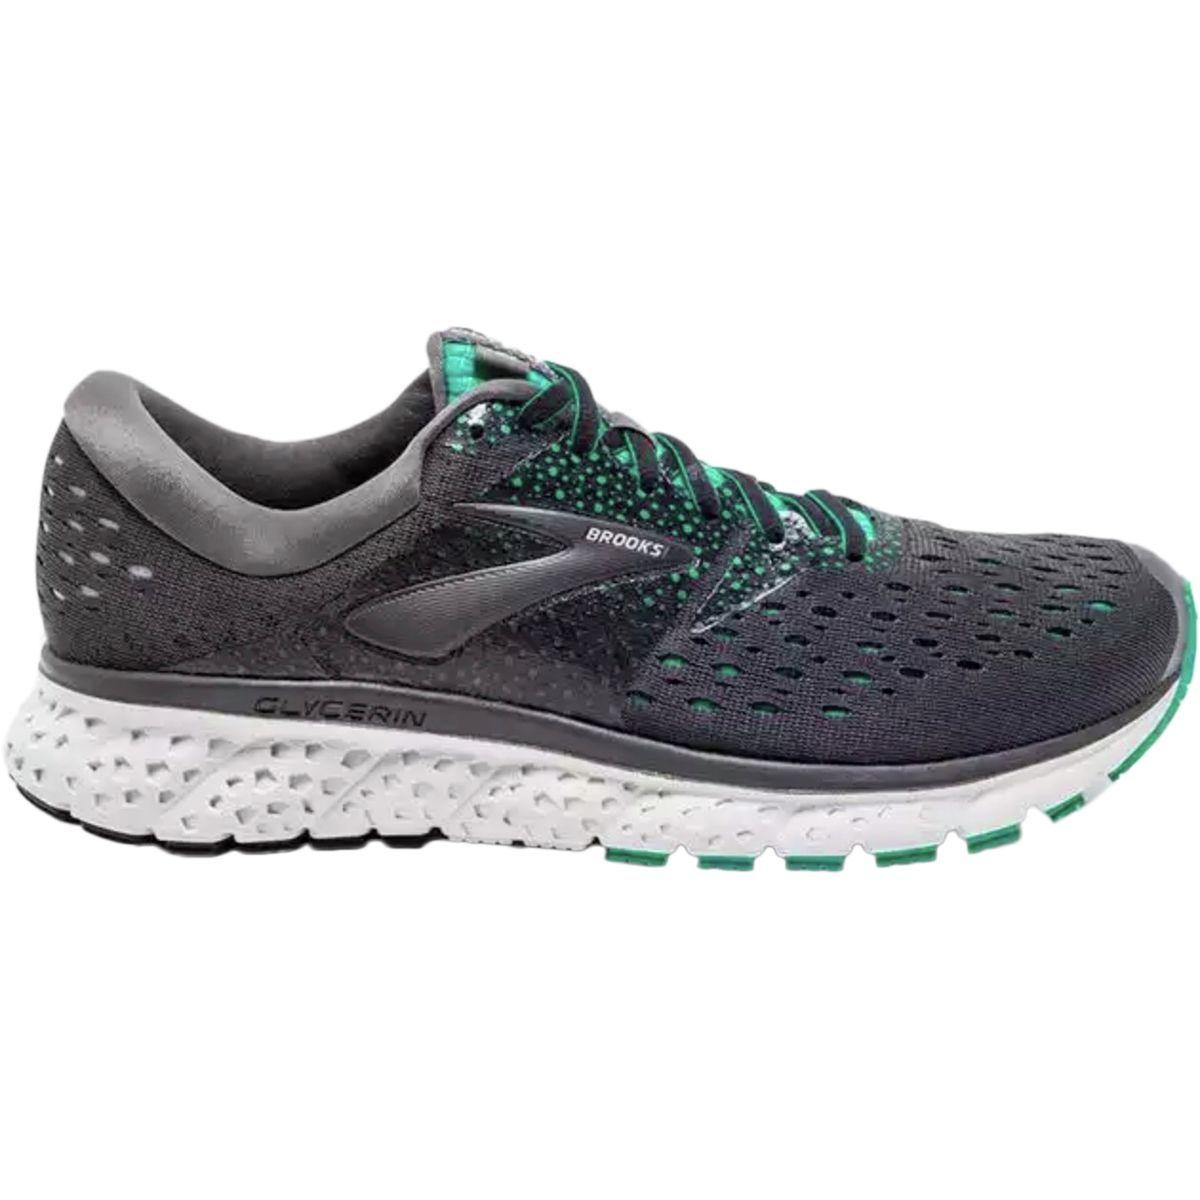 Brooks Glycerin 16 Running Shoe - Women's